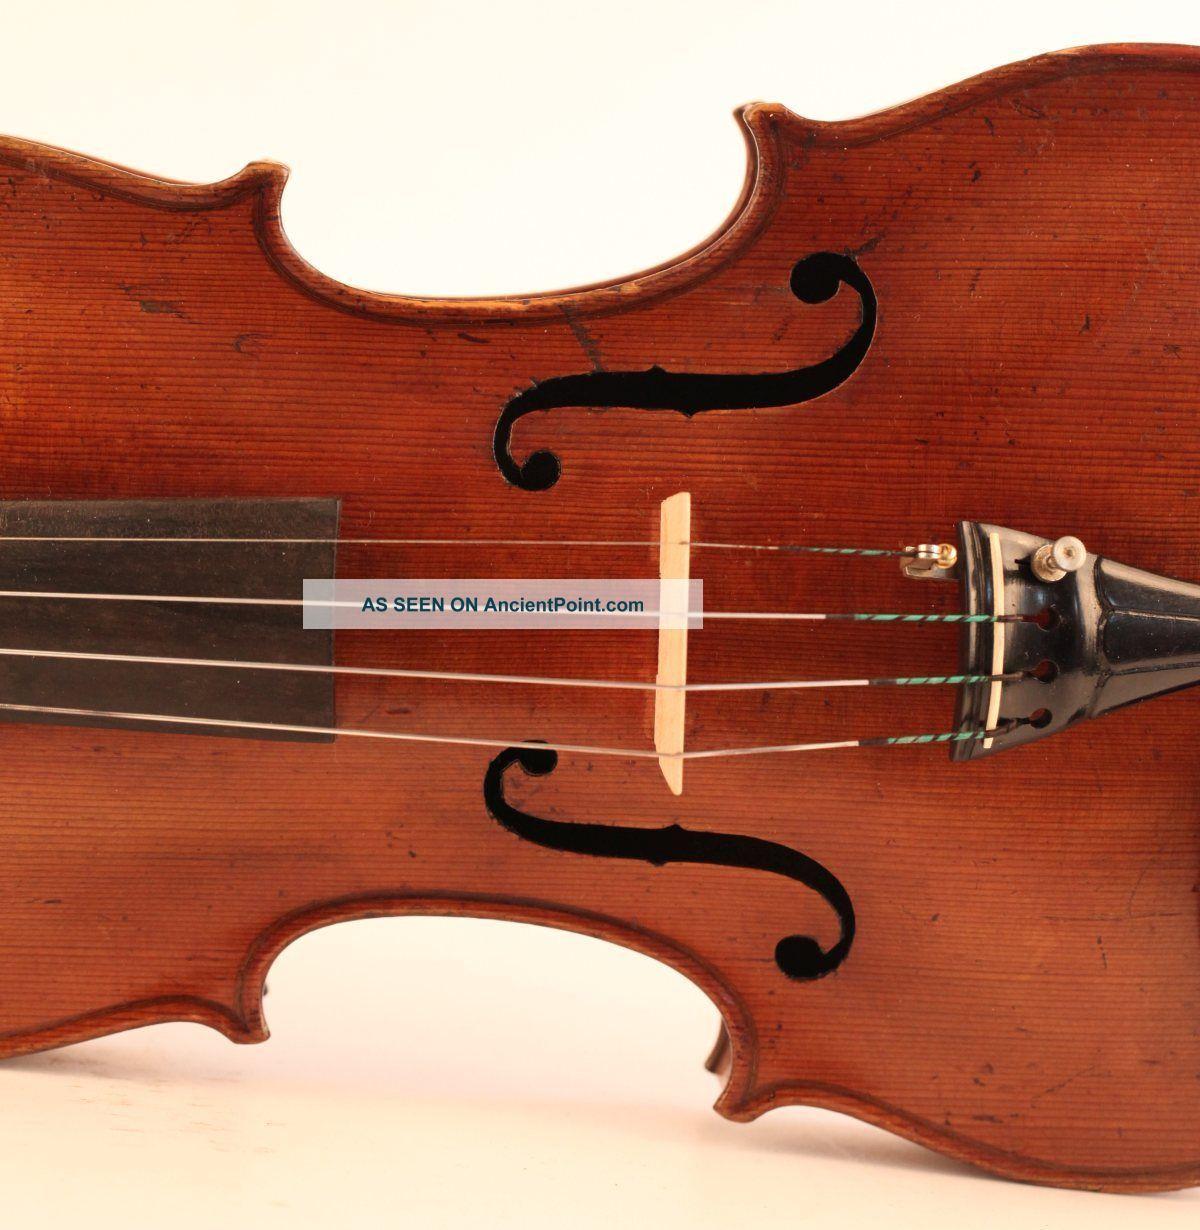 http://ancientpoint.com/imgs/a/i/z/i/r/rare_and_fine_old_italian_violin_gigli_1771_geige_violon_violine_violino_viola_3_lgw.jpg